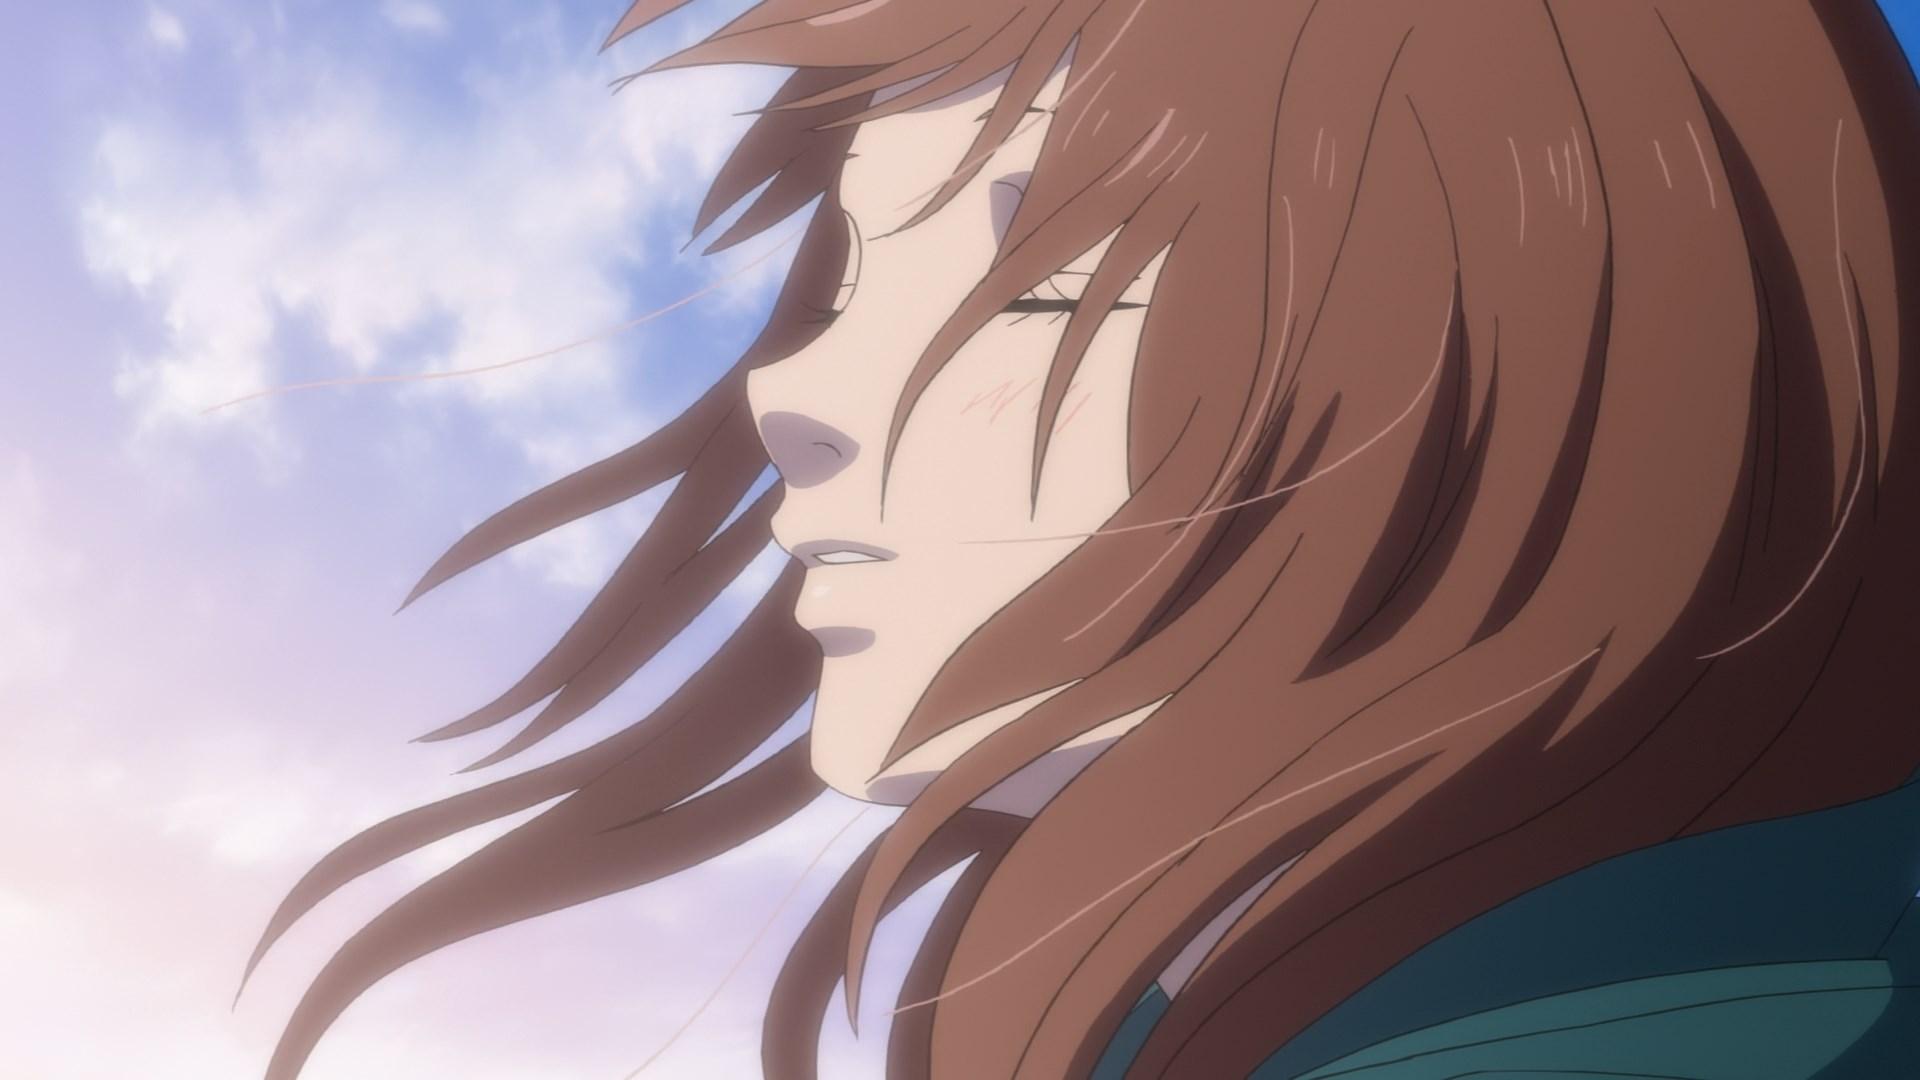 [ACF & .h] Ao Haru Ride - 05 [Blu-ray][Hi10P 1080p][AAC][58703F48].mkv_snapshot_17.55_[2017.07.08_23.18.10]